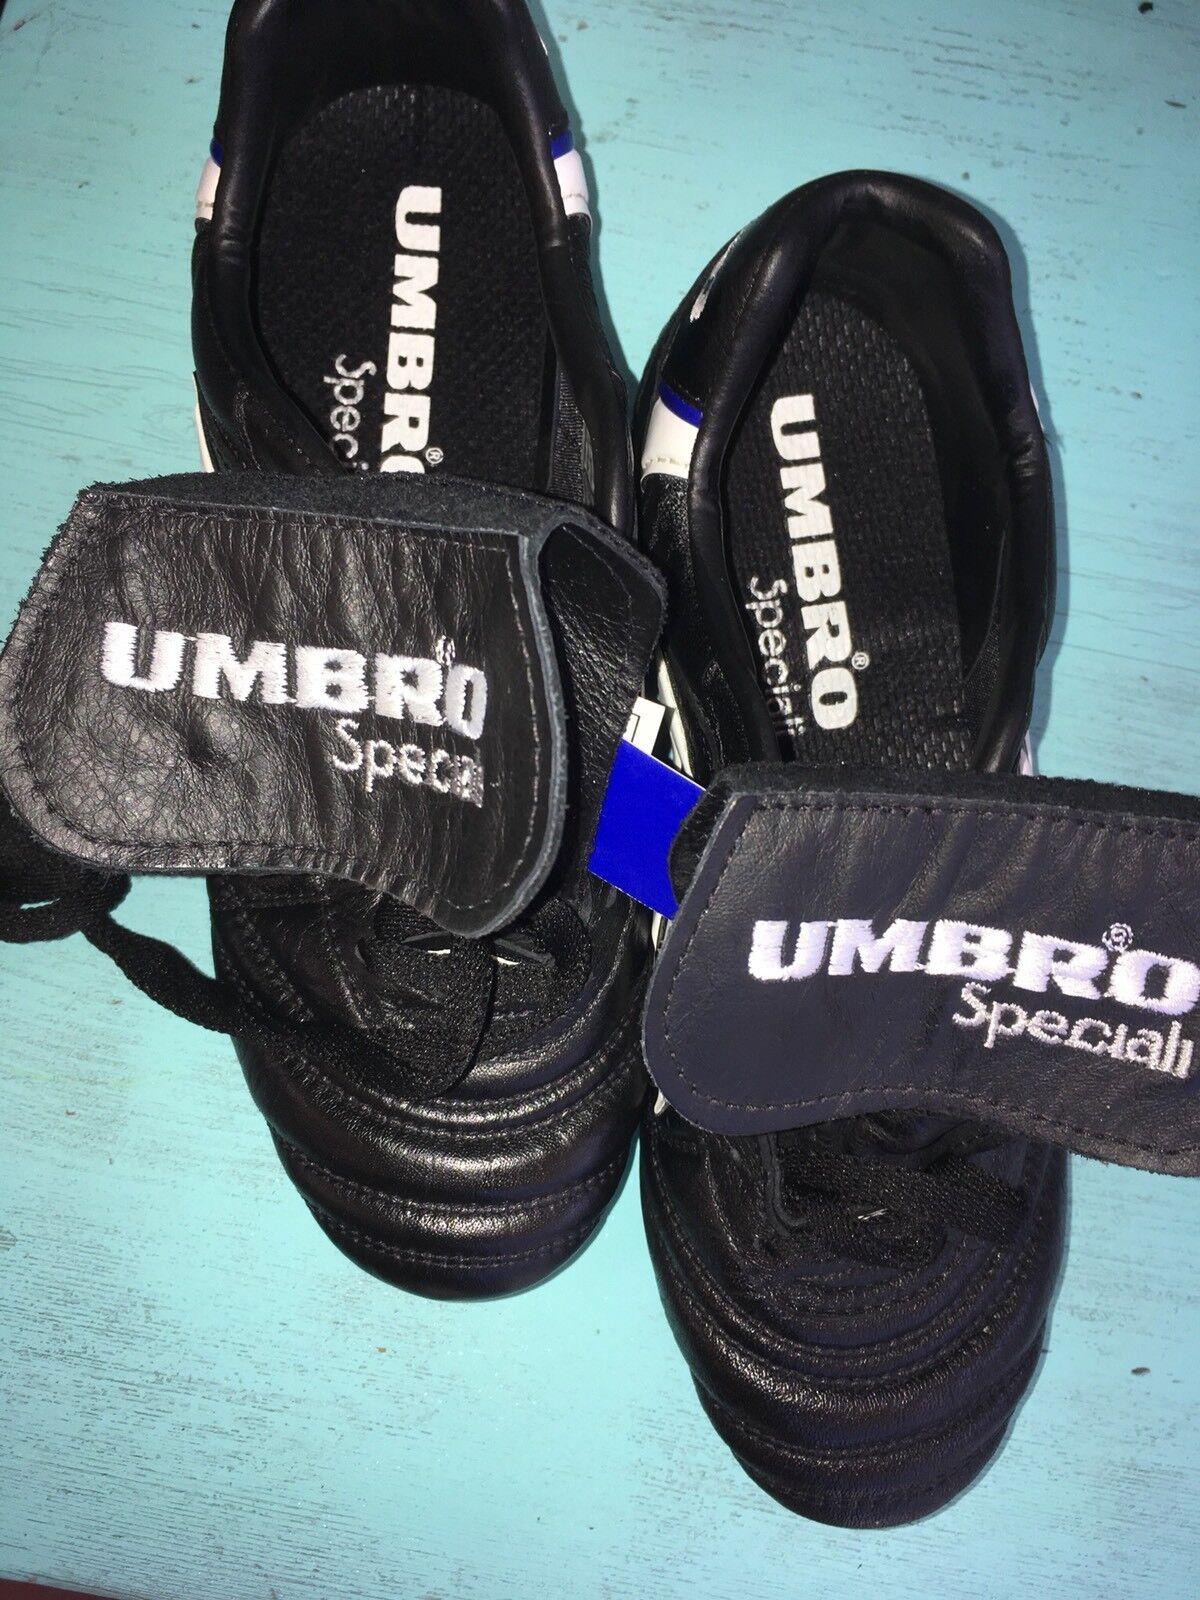 Umbro specialeei FG Memory Flex Sole Sole Sole Soccer Cleats sautope K-Leather Sz 6.5 d1a